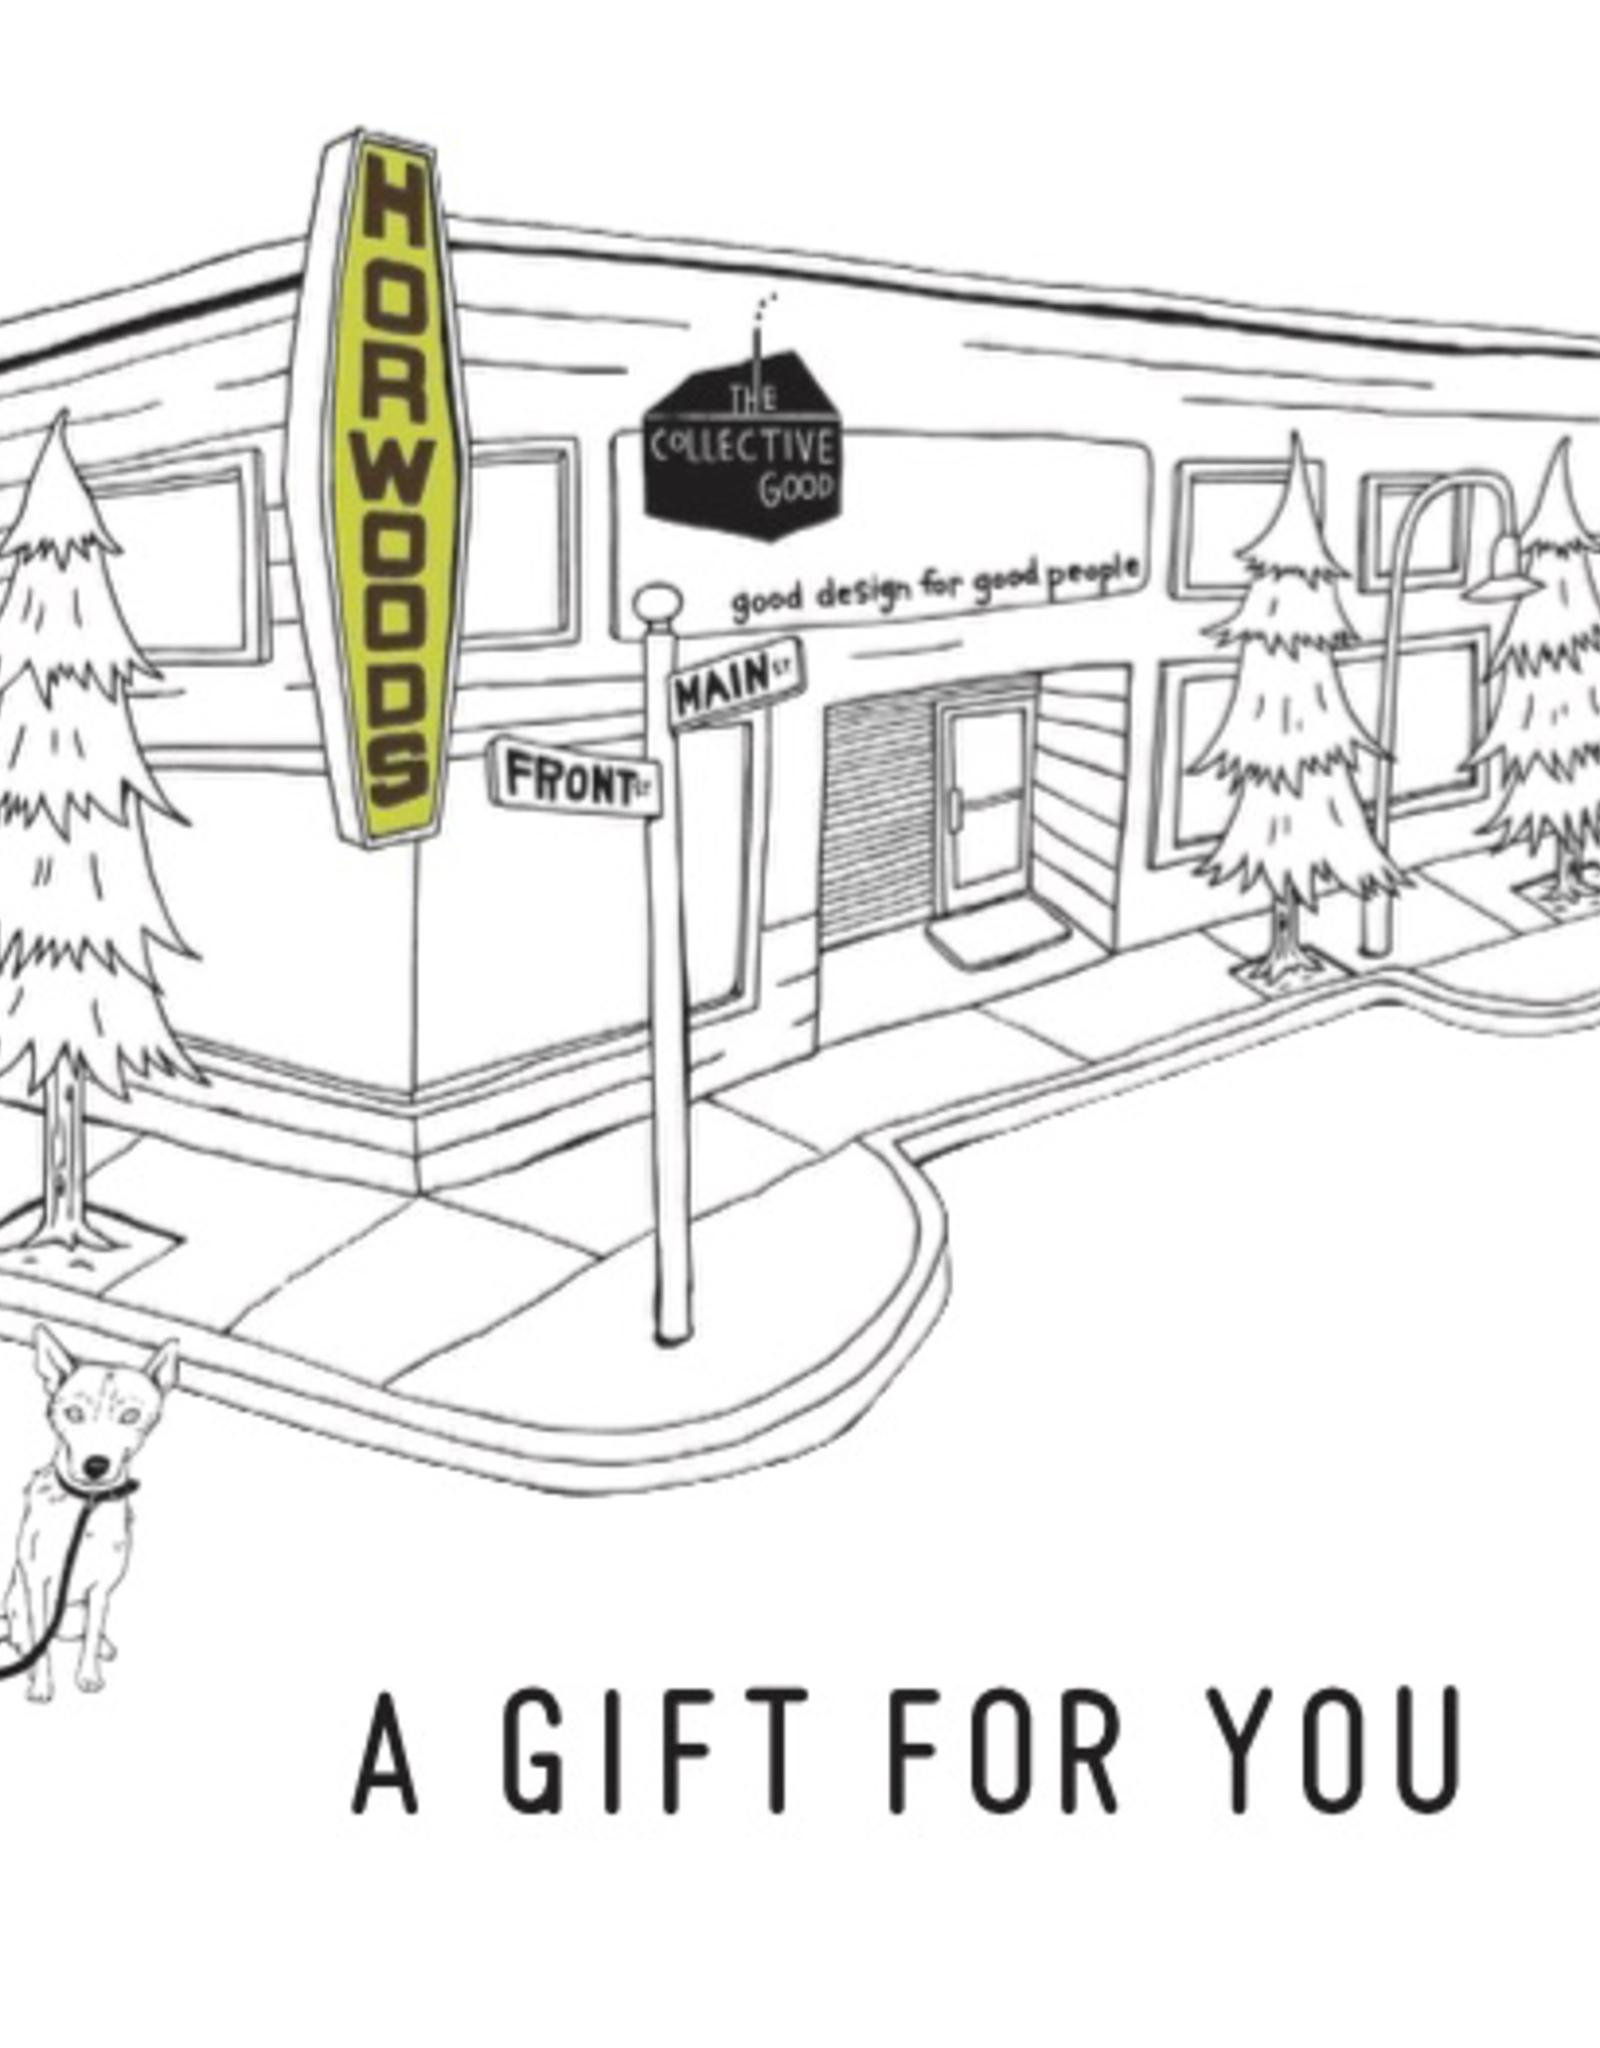 TCG The Collective Good Gift Card - $25